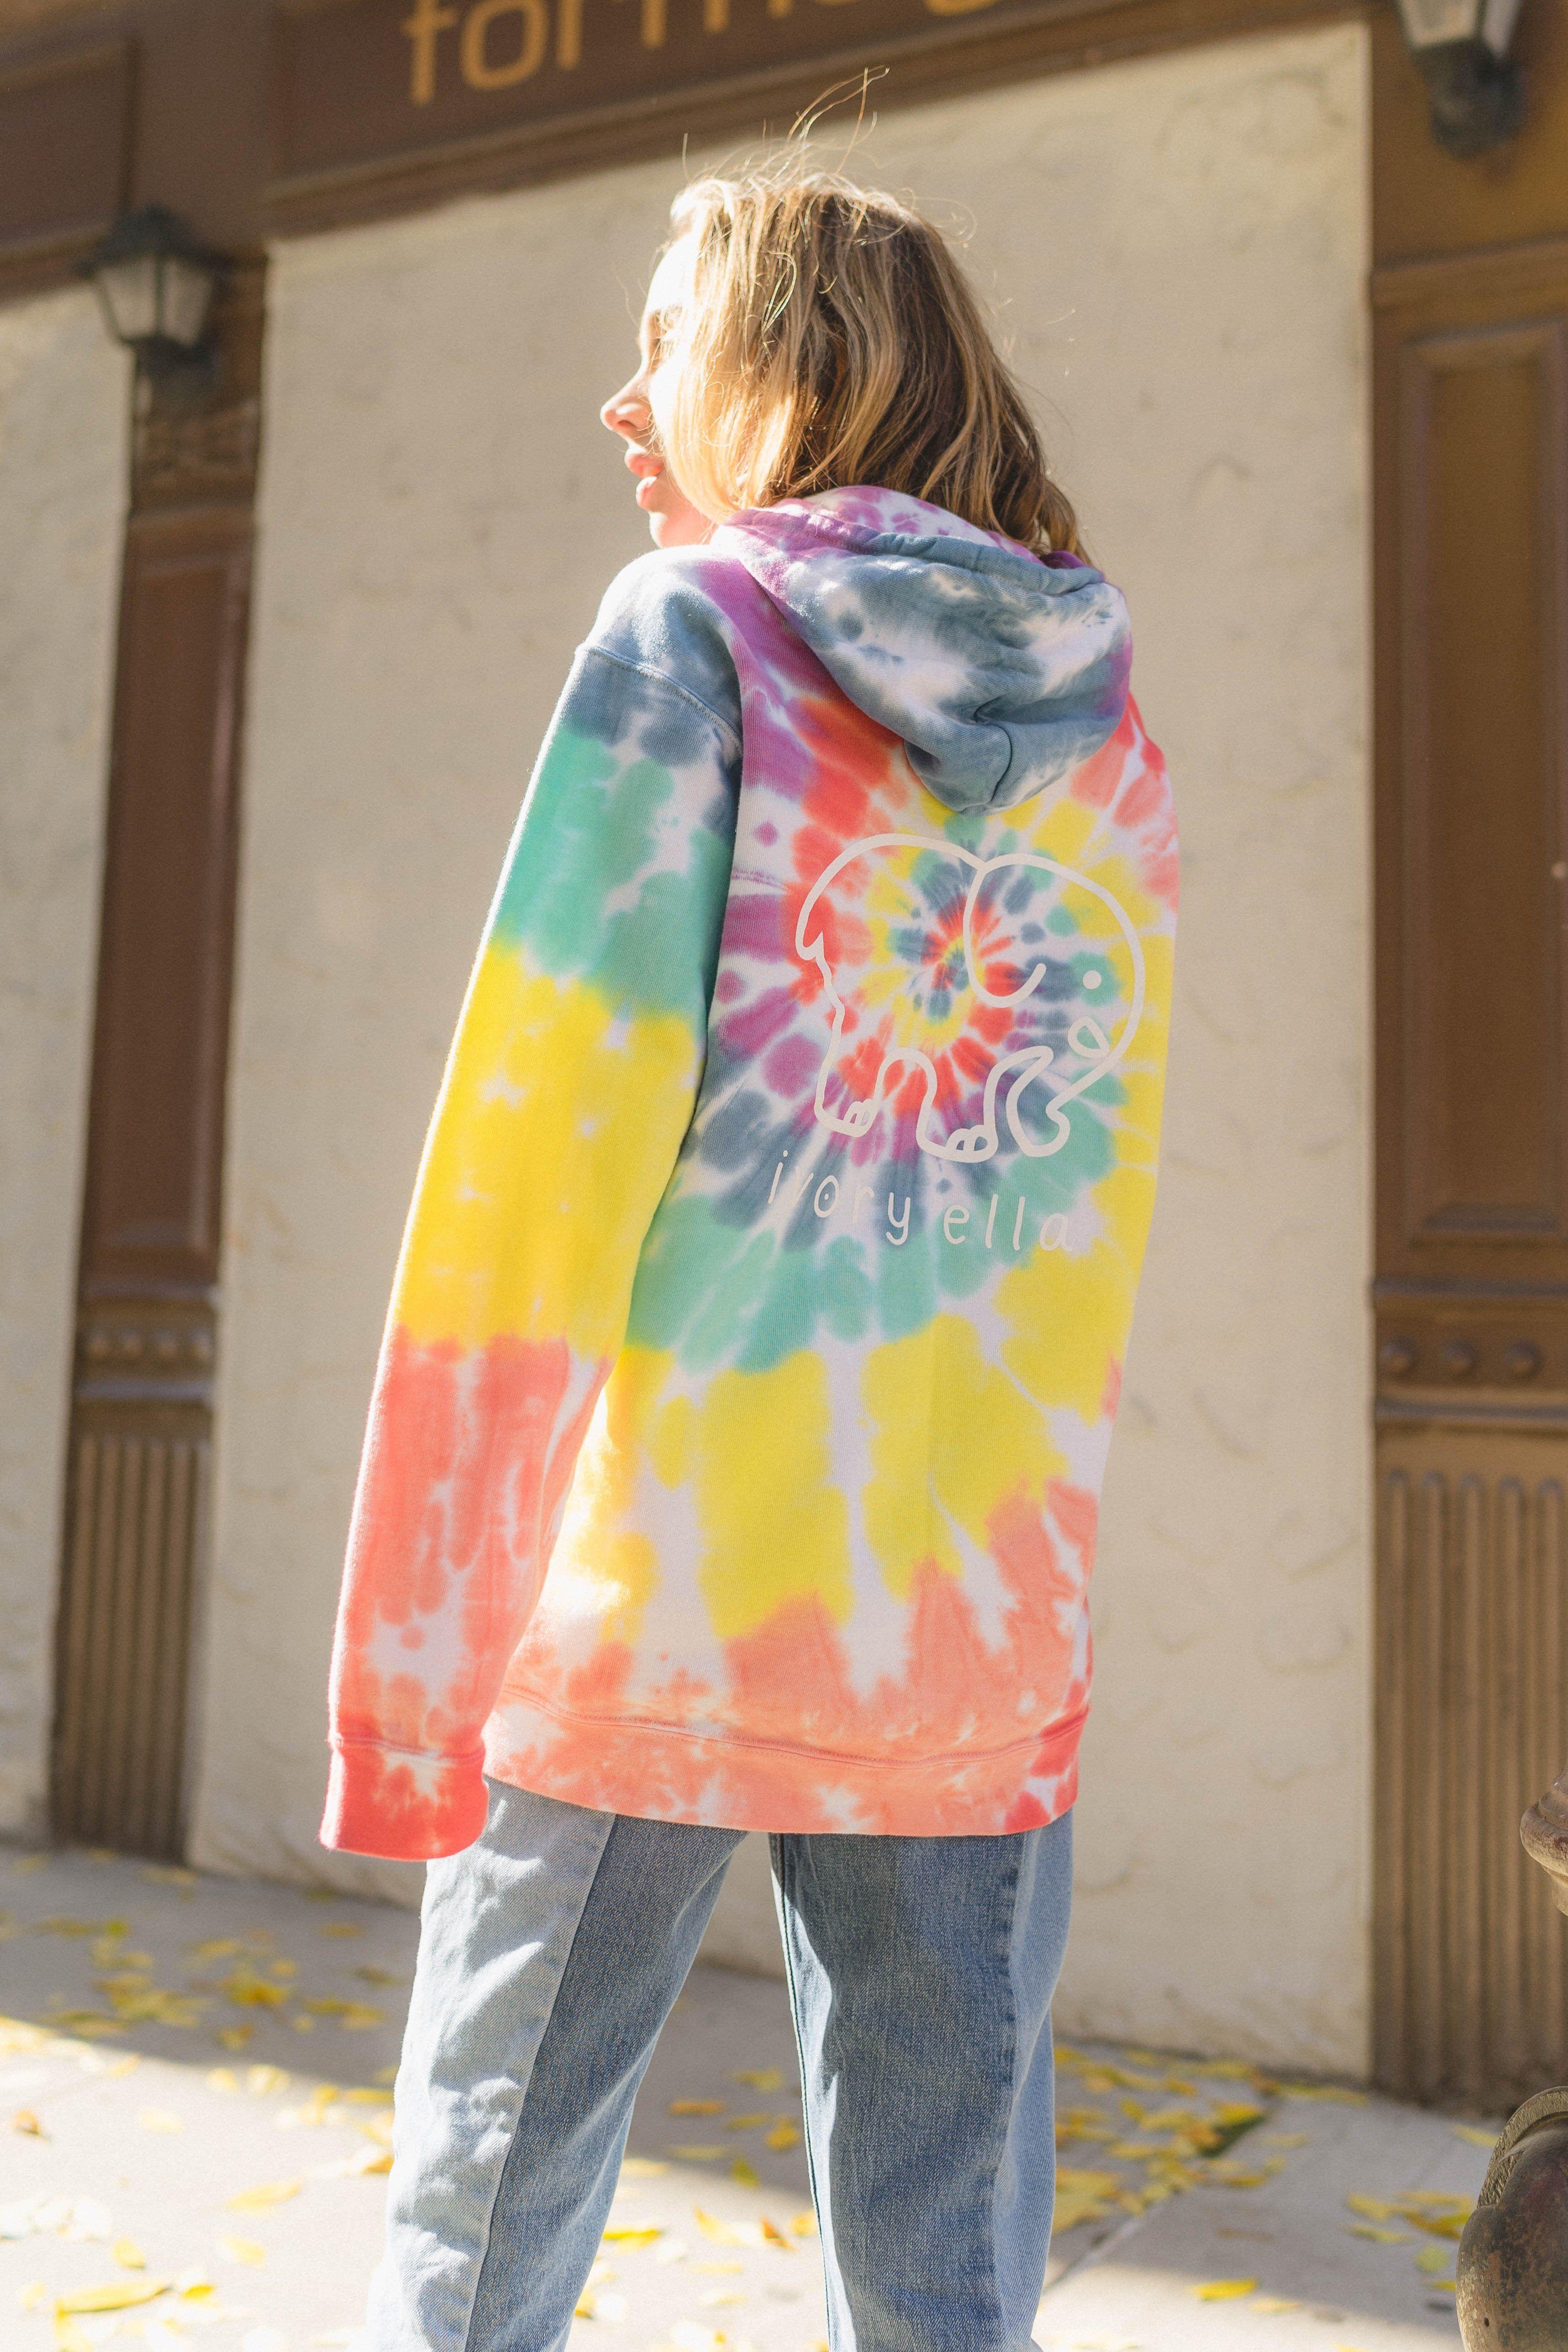 Oversized Rainbow Tie Dye Hoodie Rainbow Tie Dye Hoodie Tie Dye Hoodie Tie Dye [ 5148 x 3432 Pixel ]